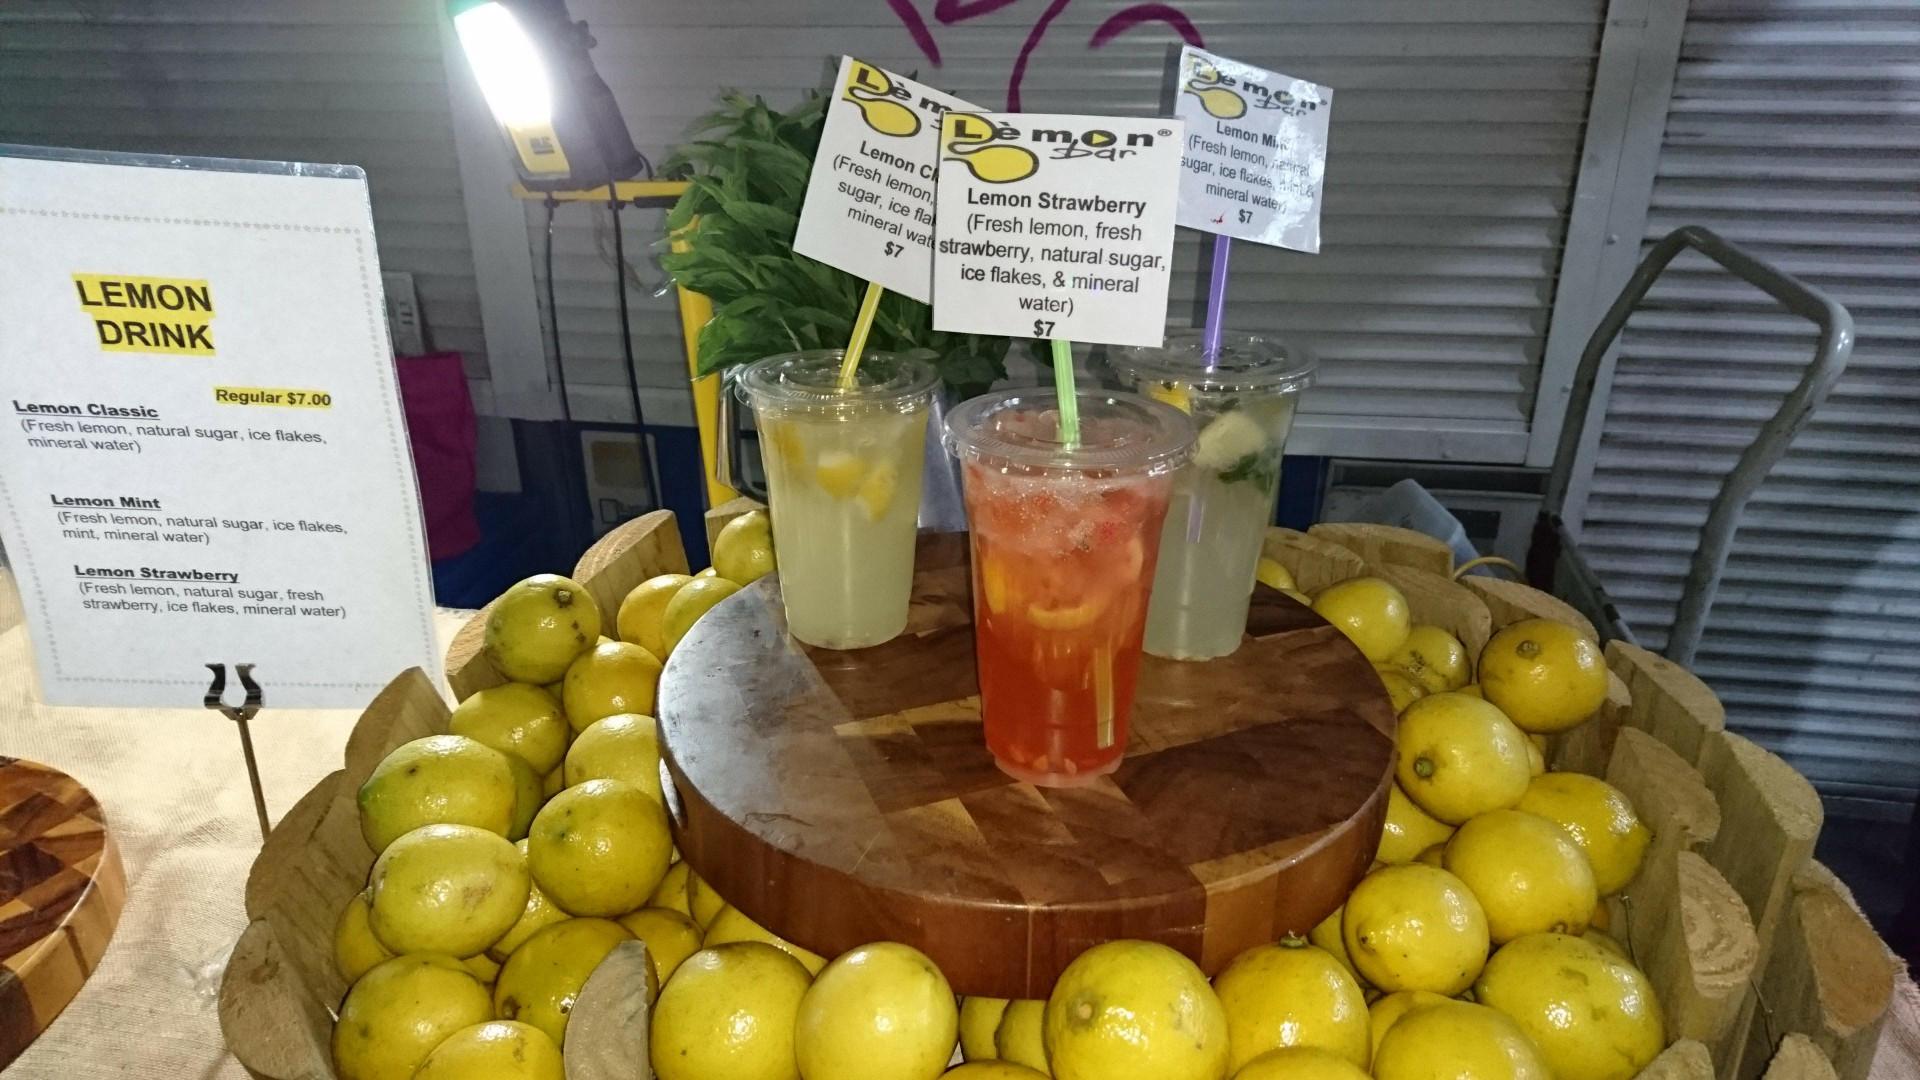 lemon drink stand